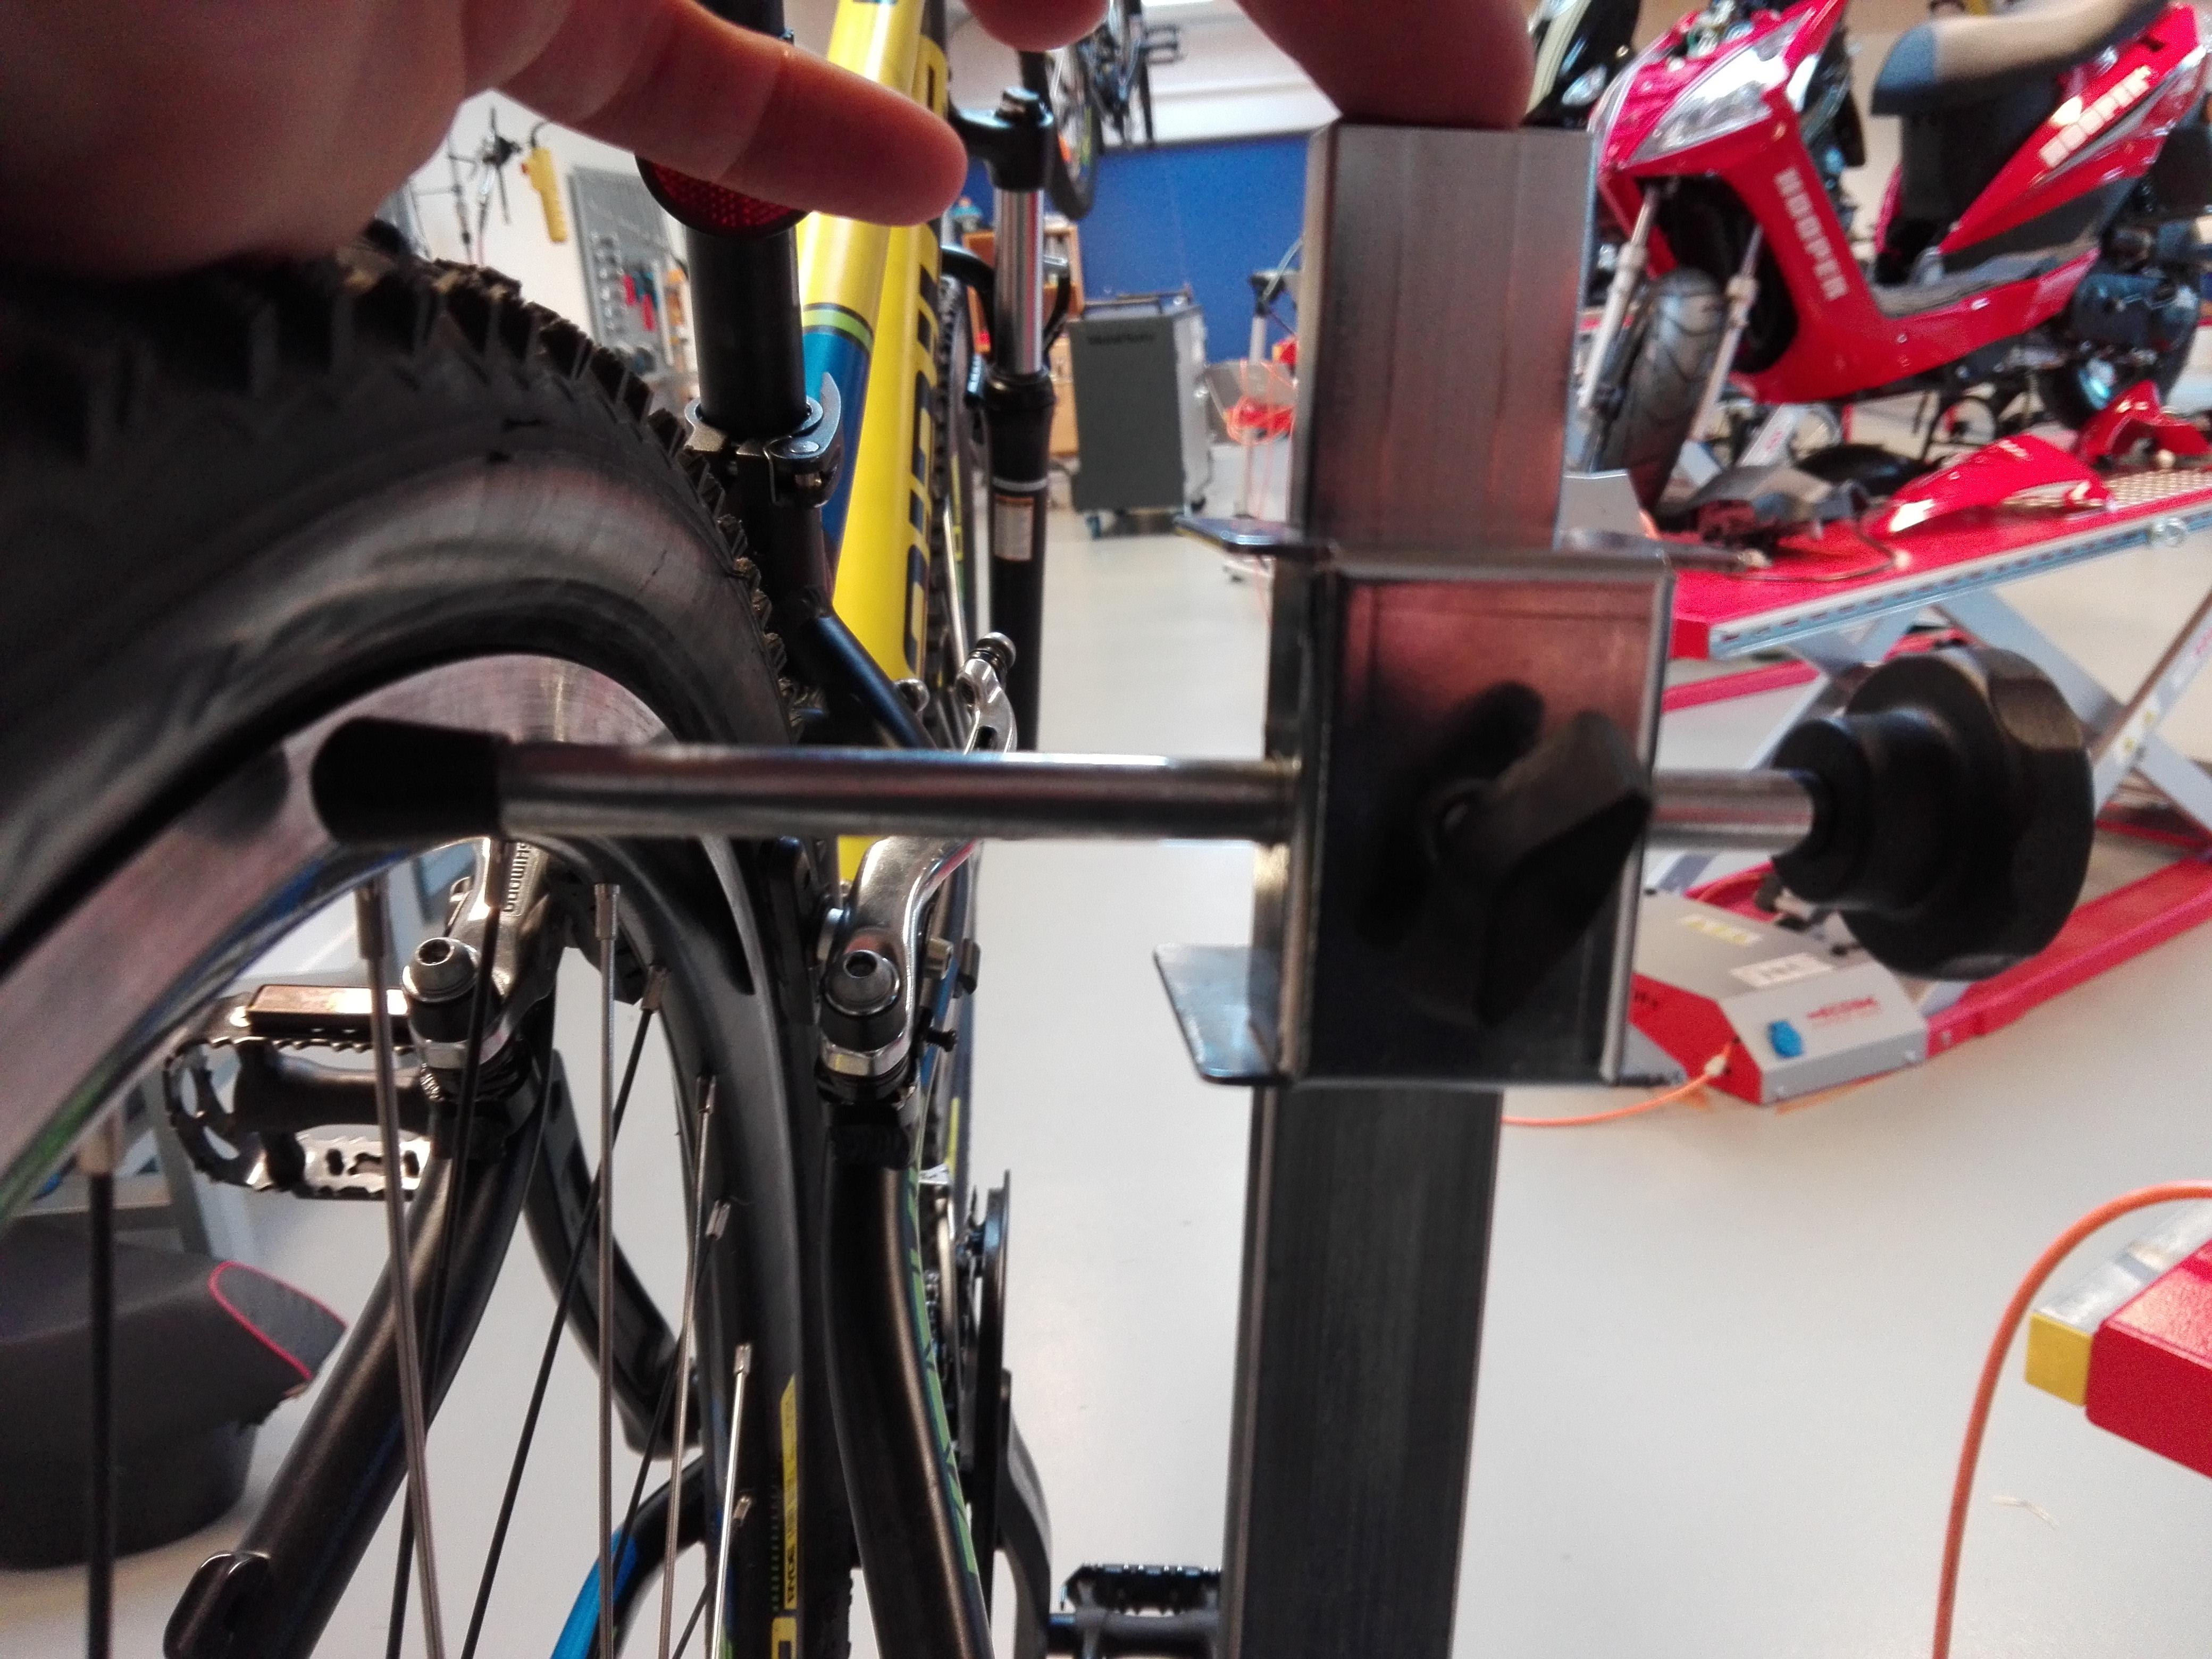 opretning af cykelhjul